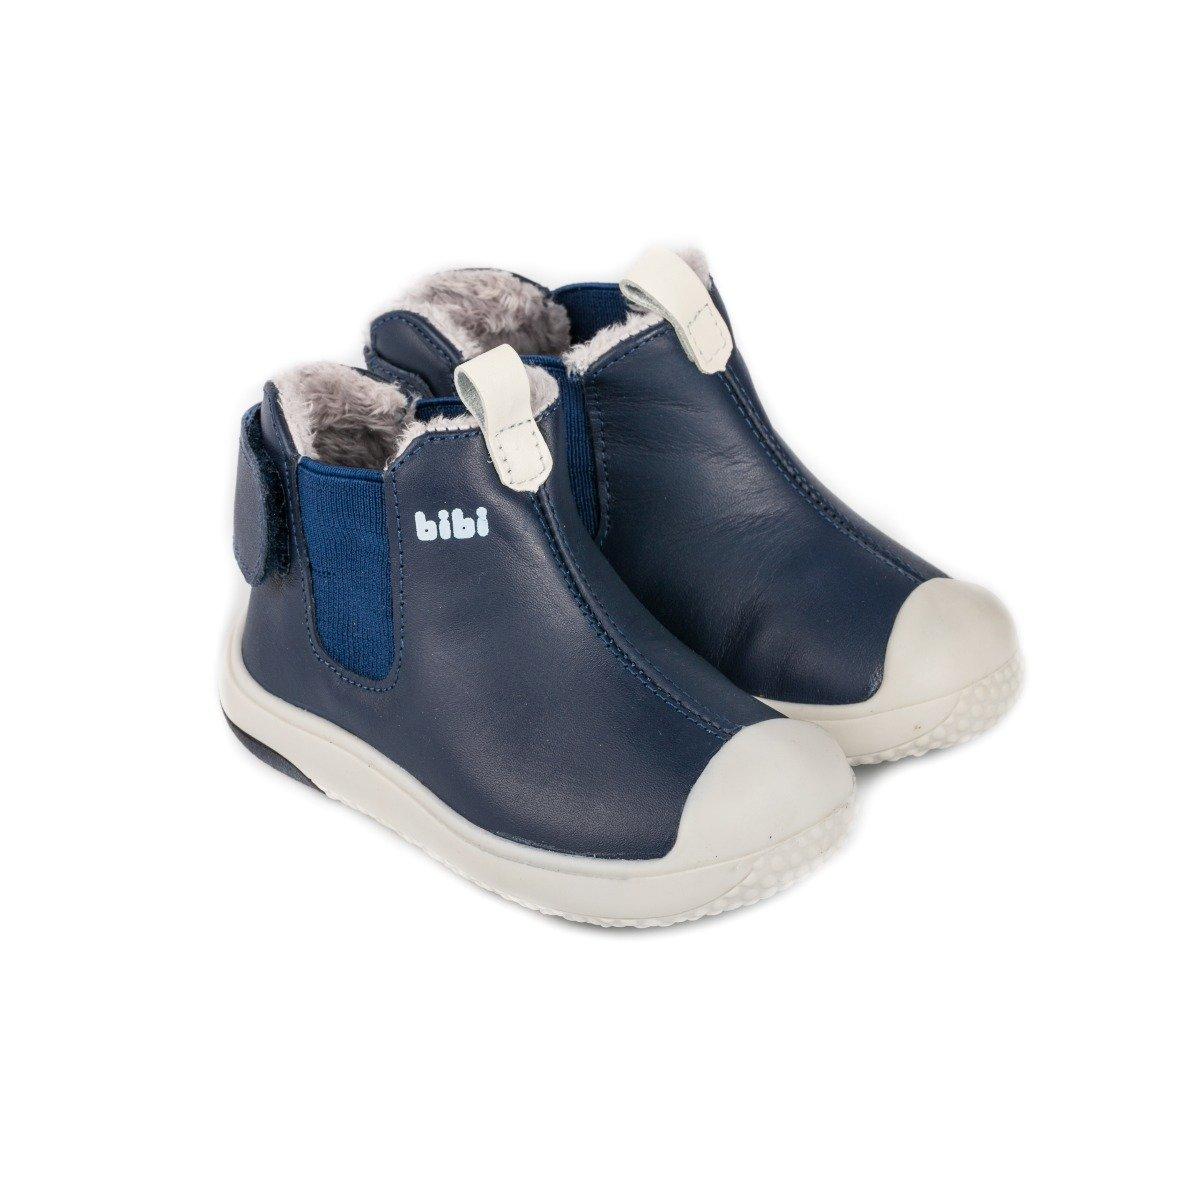 Ghete cu blanita Bibi Shoes Prewalker Naval imagine